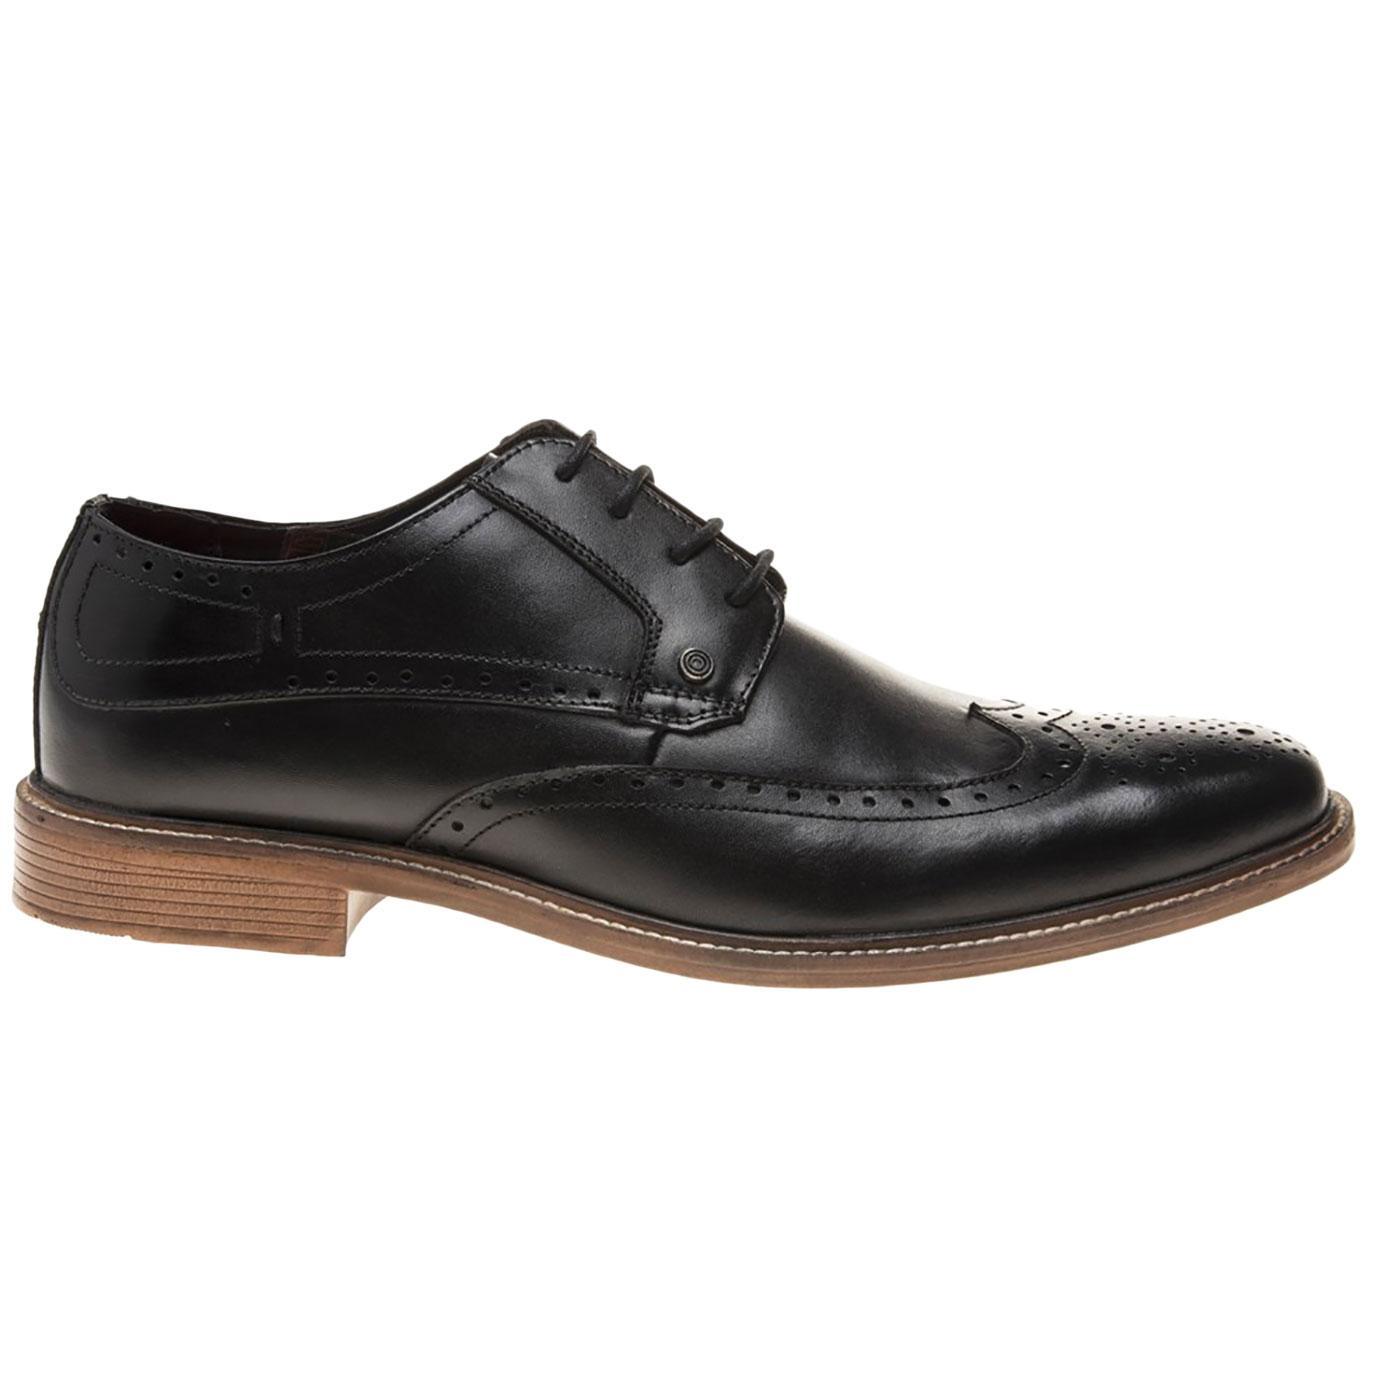 LAMBRETTA Men's 60s Mod Derby Brogue Shoes (Black)